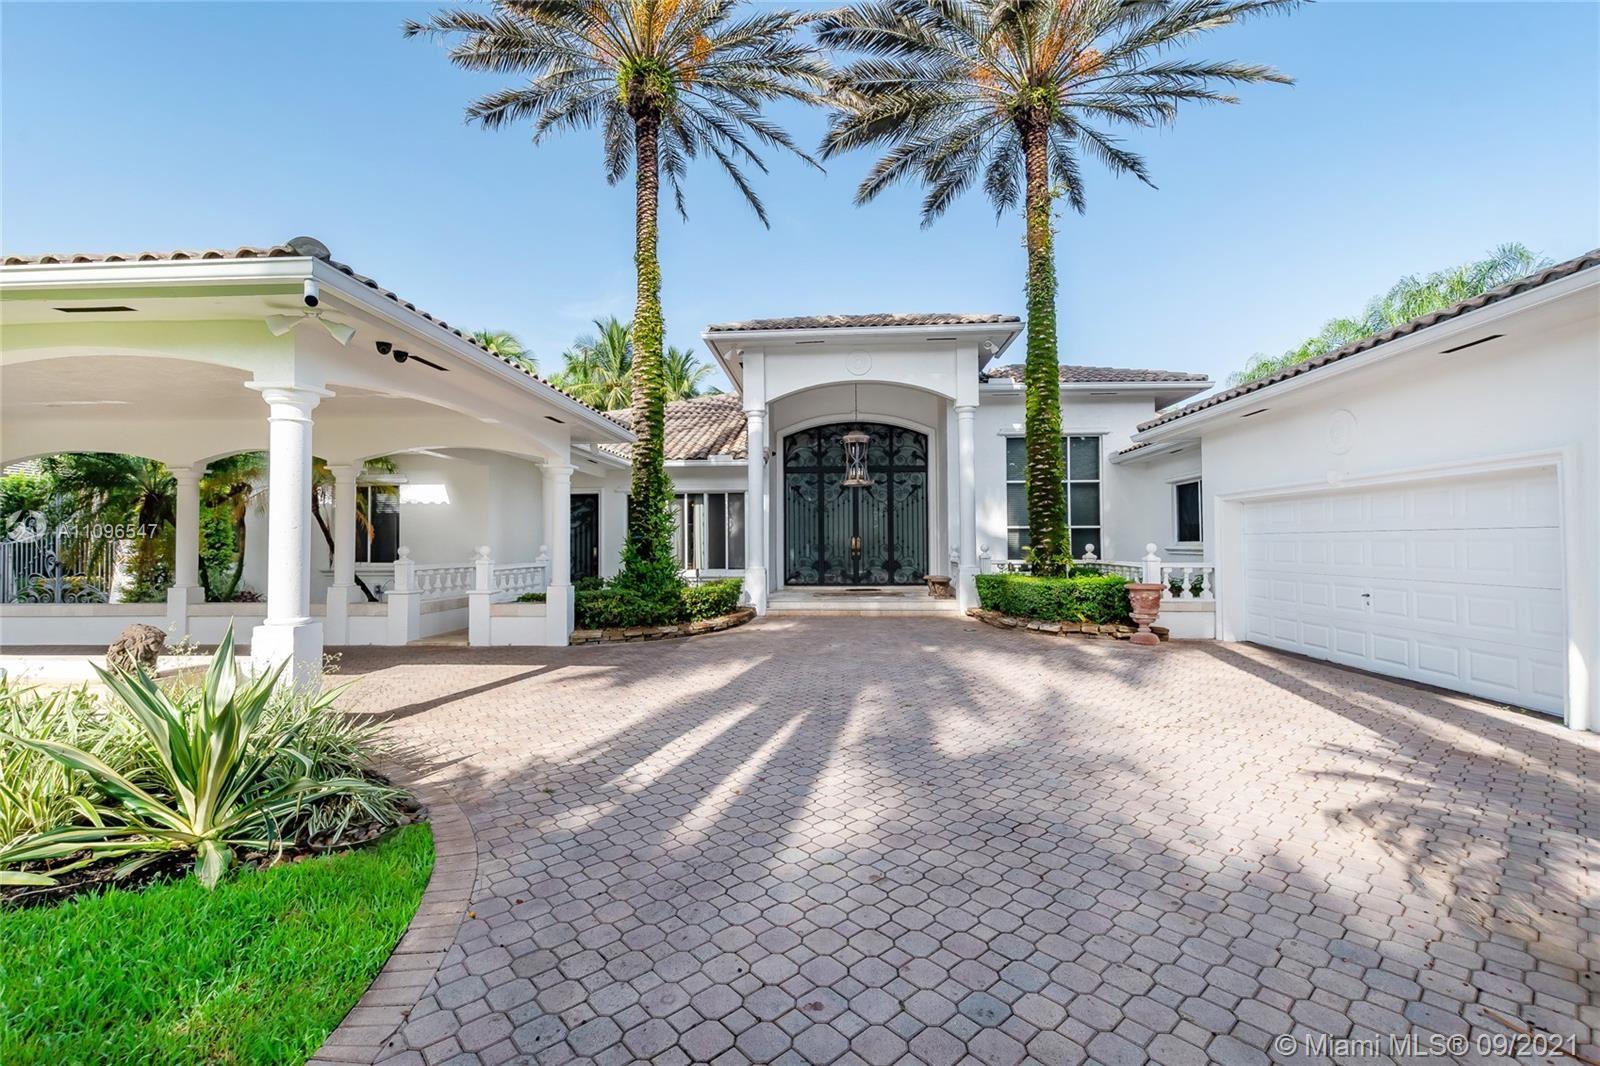 10100 SW 92nd Ave, Miami, FL 33176 - #: A11096547